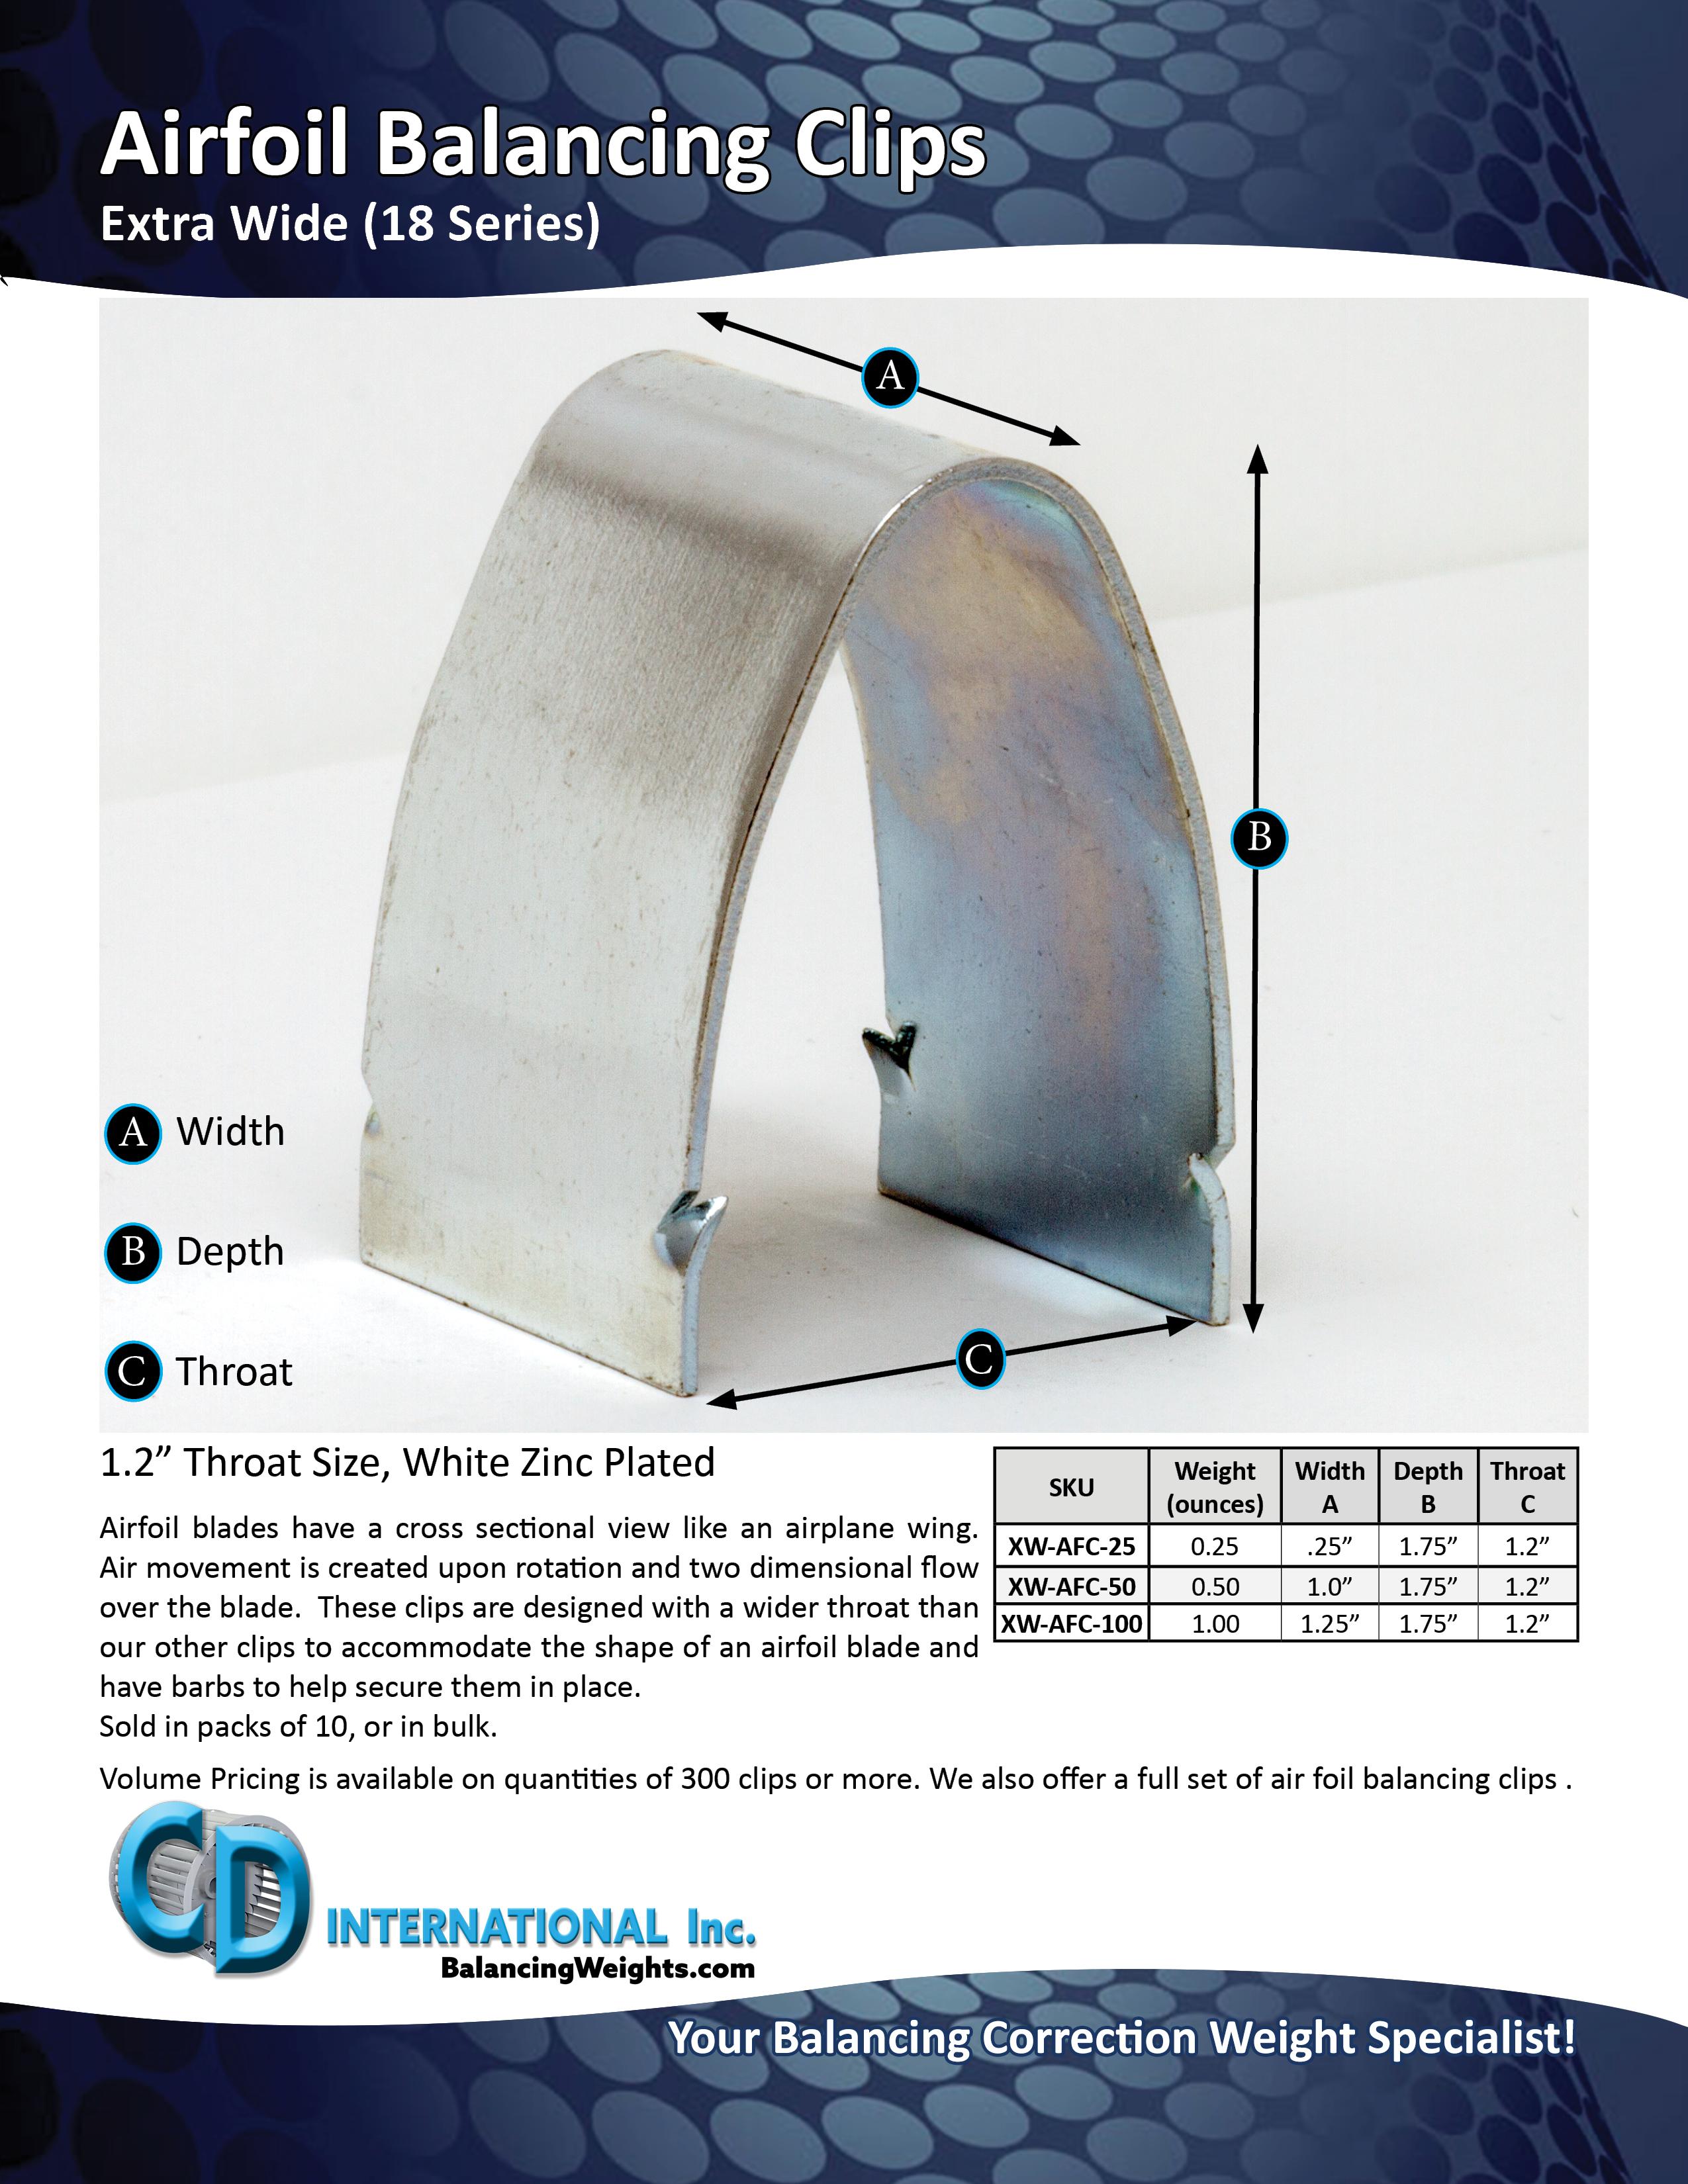 xw-afc-spec-sheets.jpg